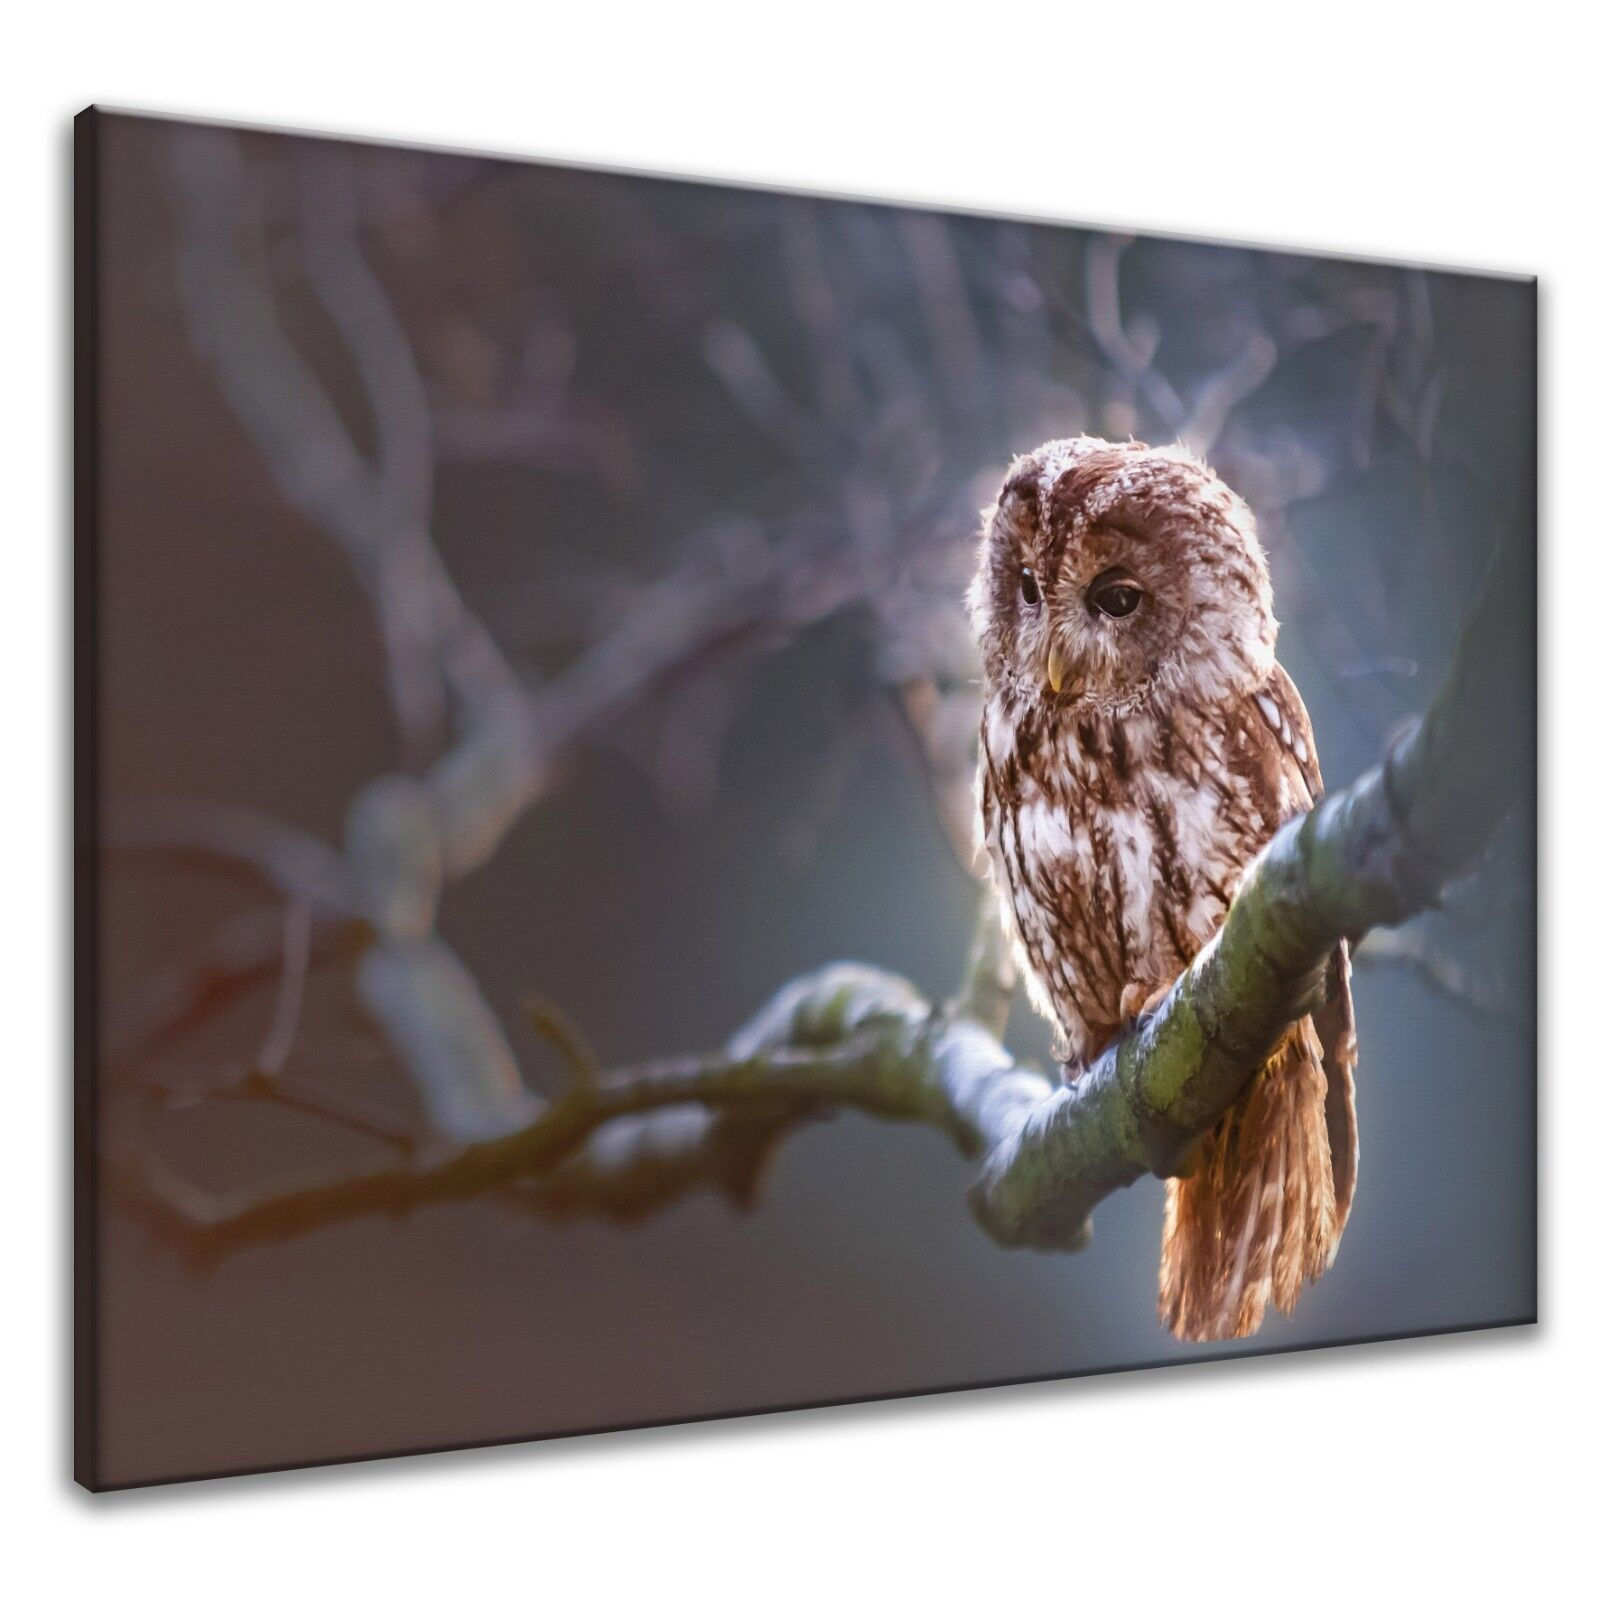 Leinwand-Bilder Wandbild Canvas Kunstdruck Tier Wachende Eule